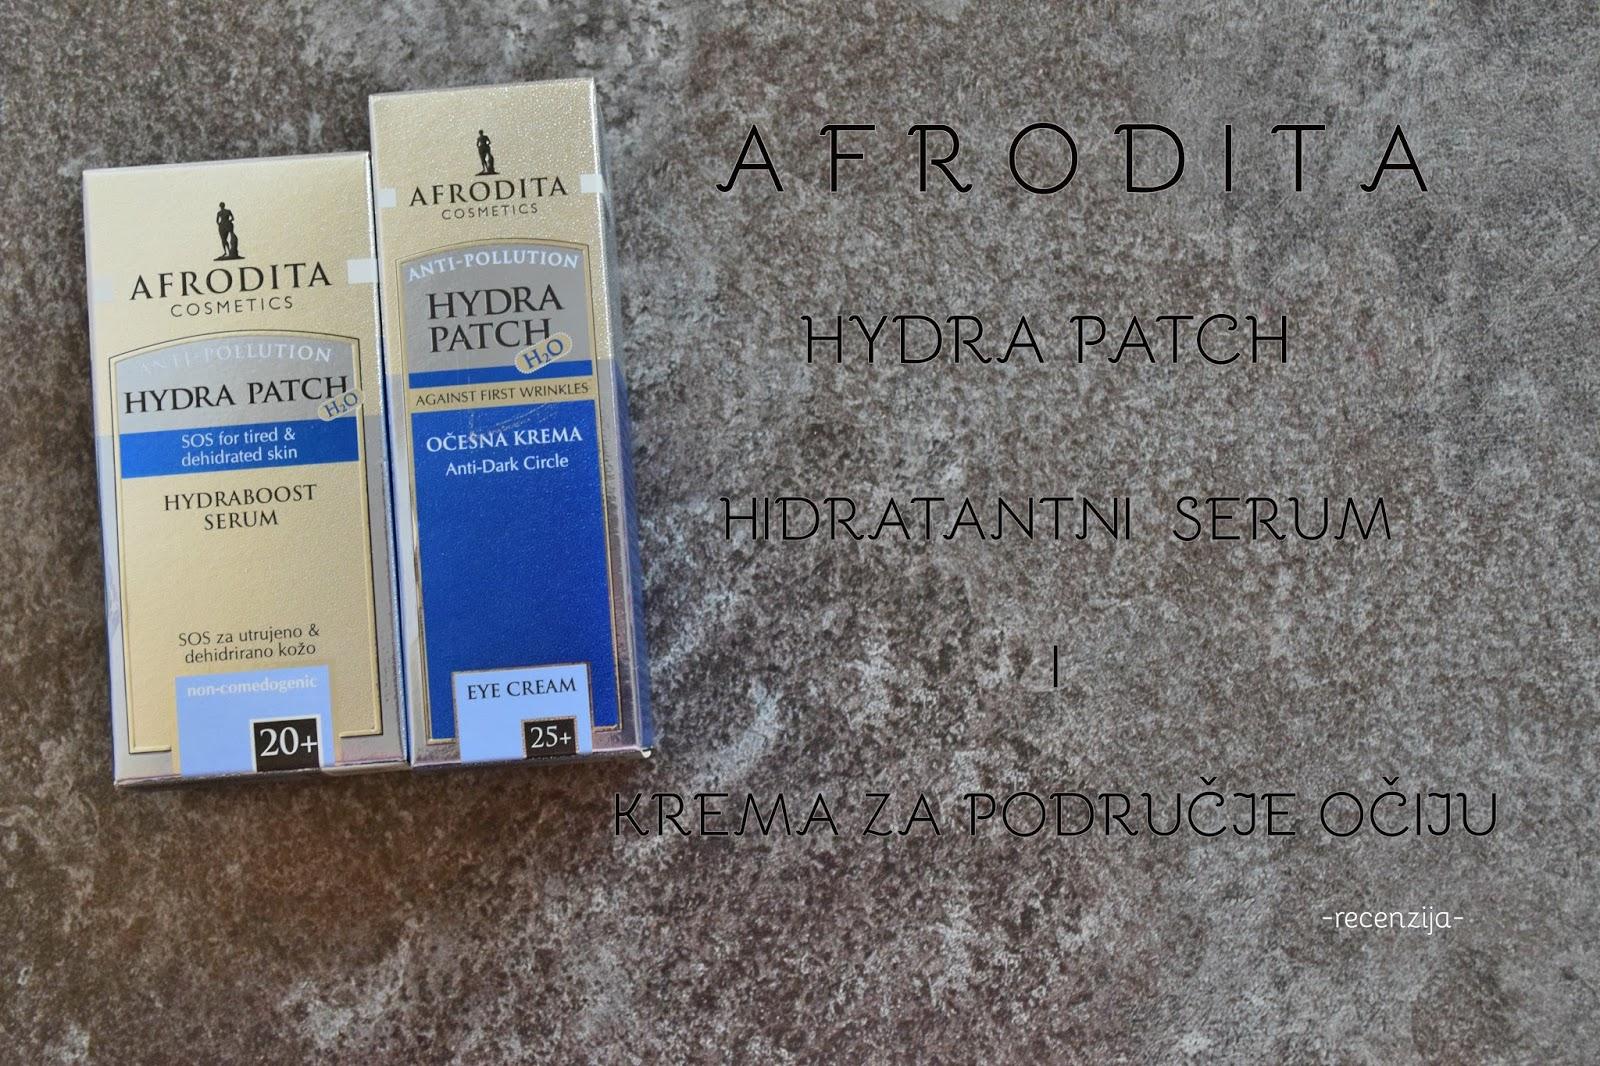 Afrodita-Hydra-patch-linija